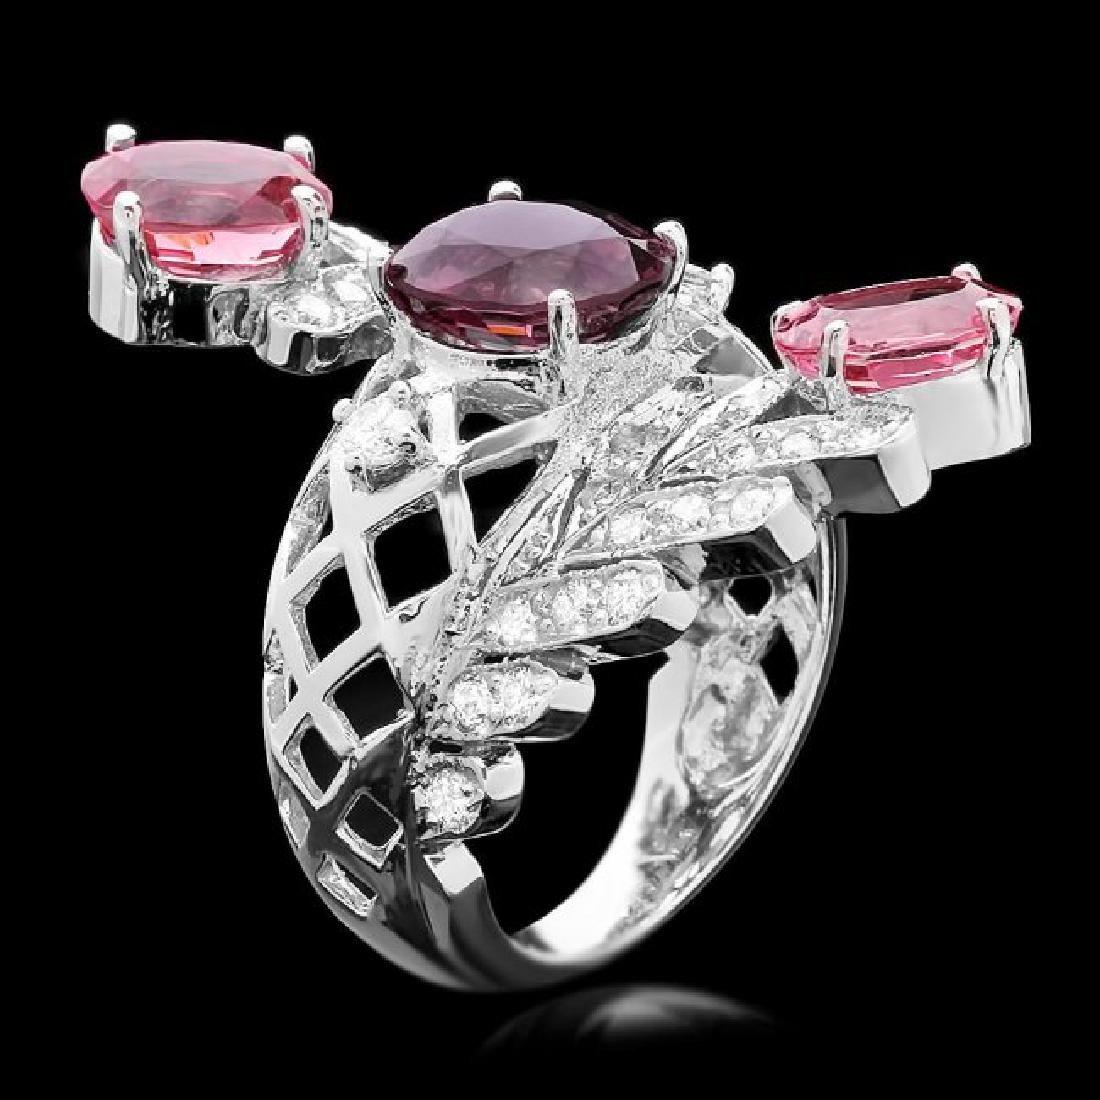 14k White Gold 5.5ct Spinel 1.00ct Diamond Ring - 3